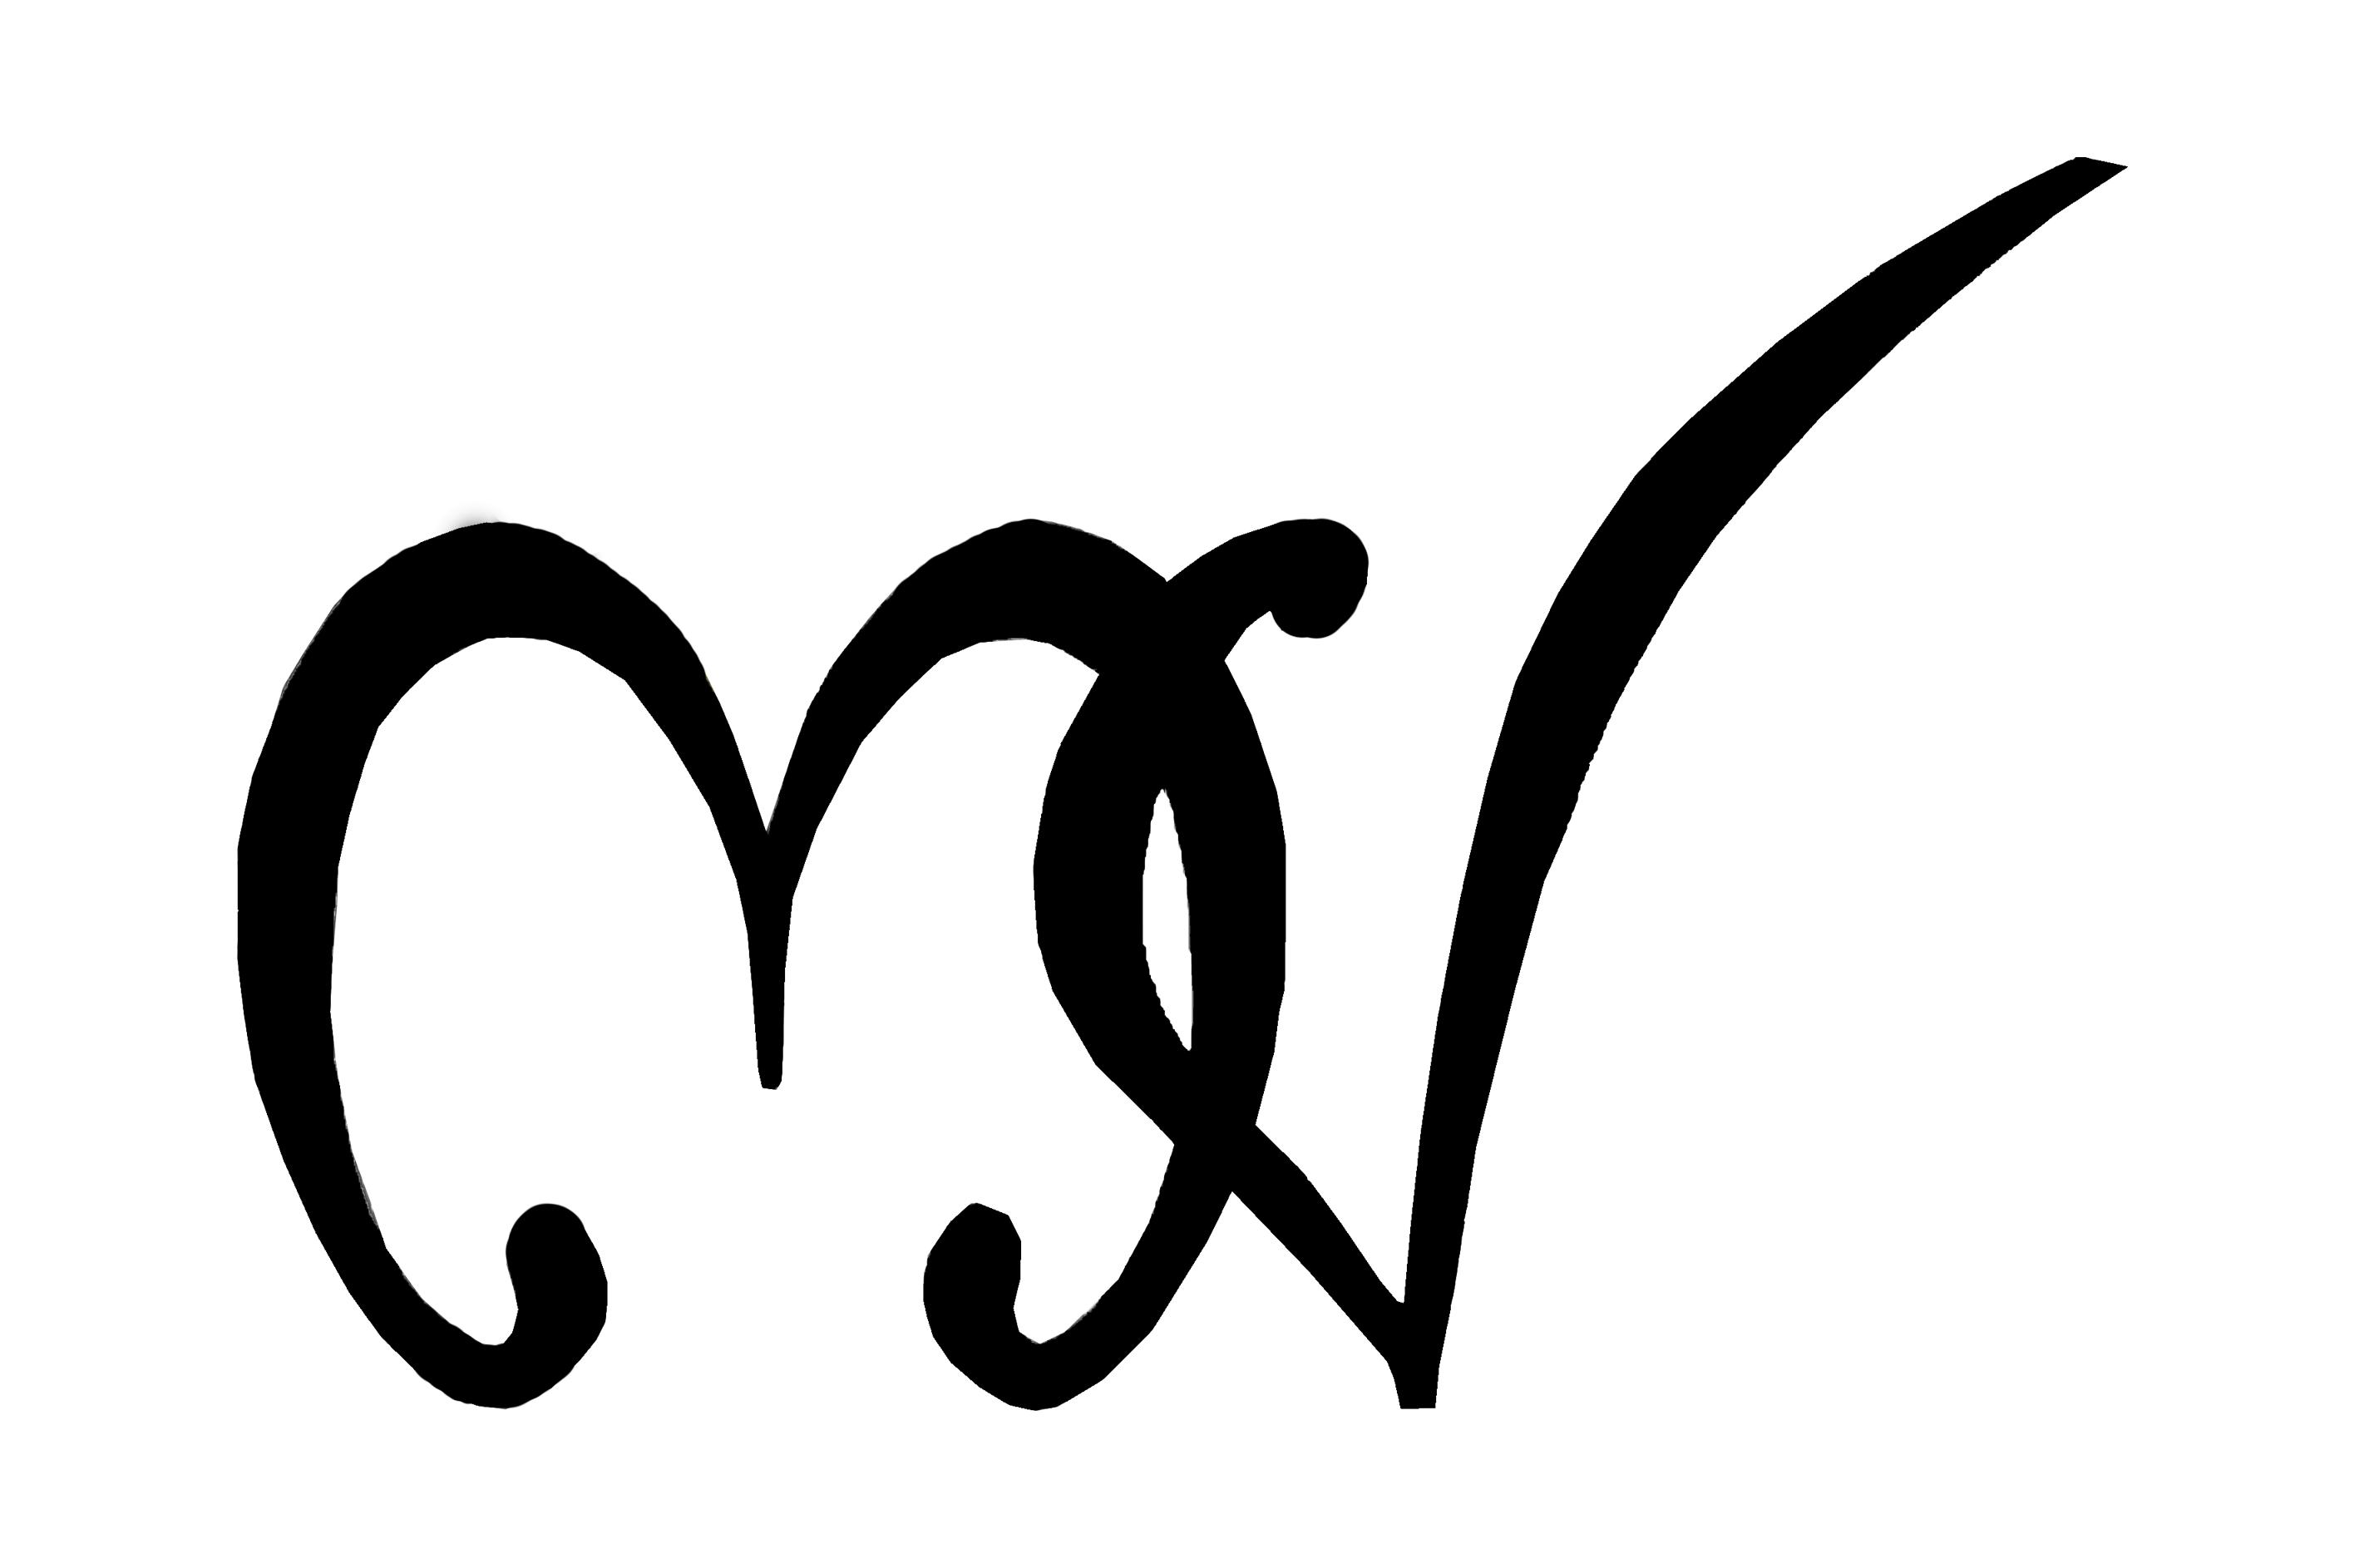 MagdolnaVeronika